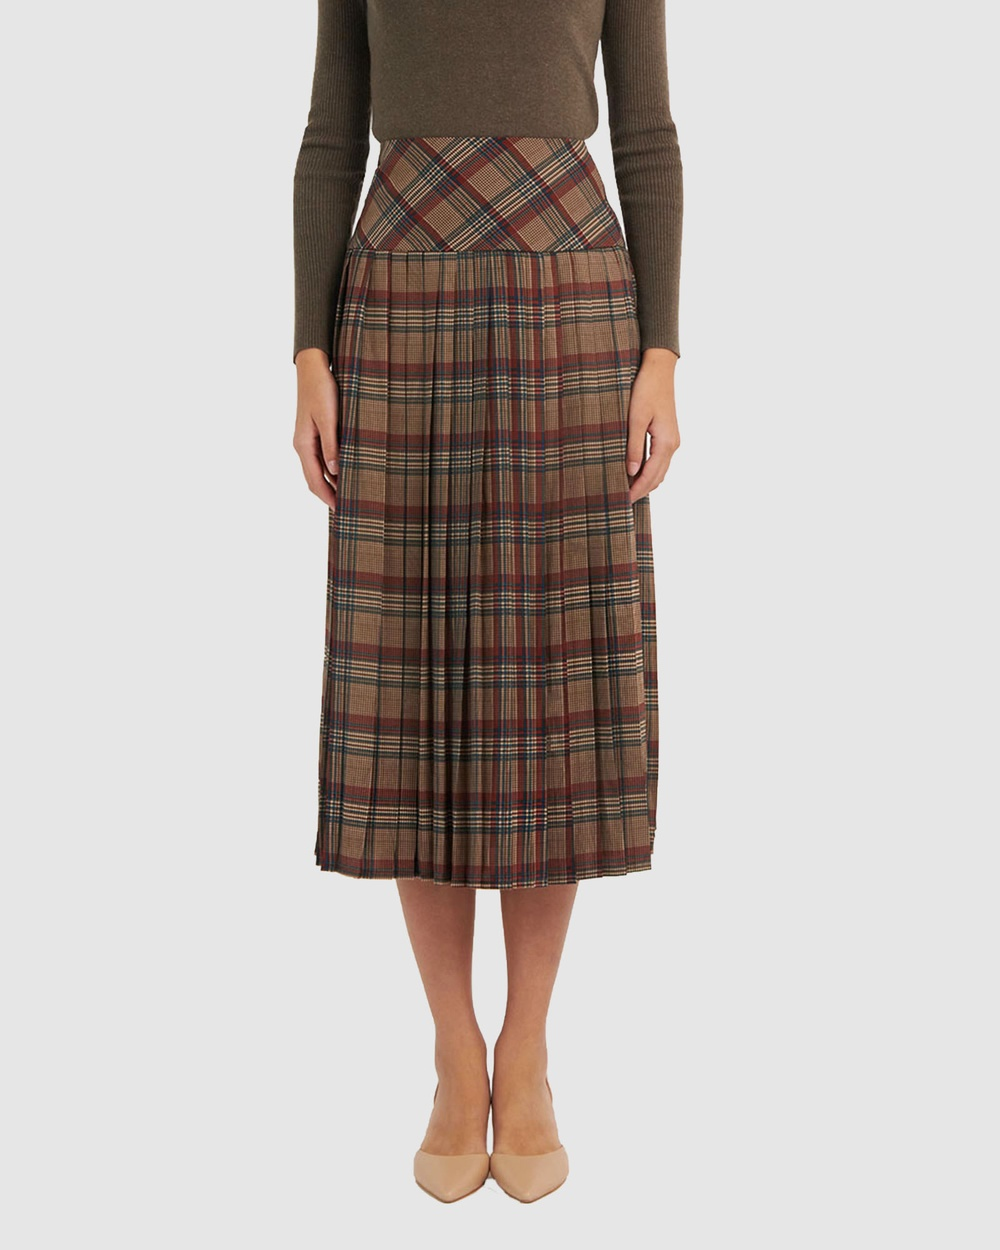 Forcast Alexa Pleated Check Skirt skirts Multi